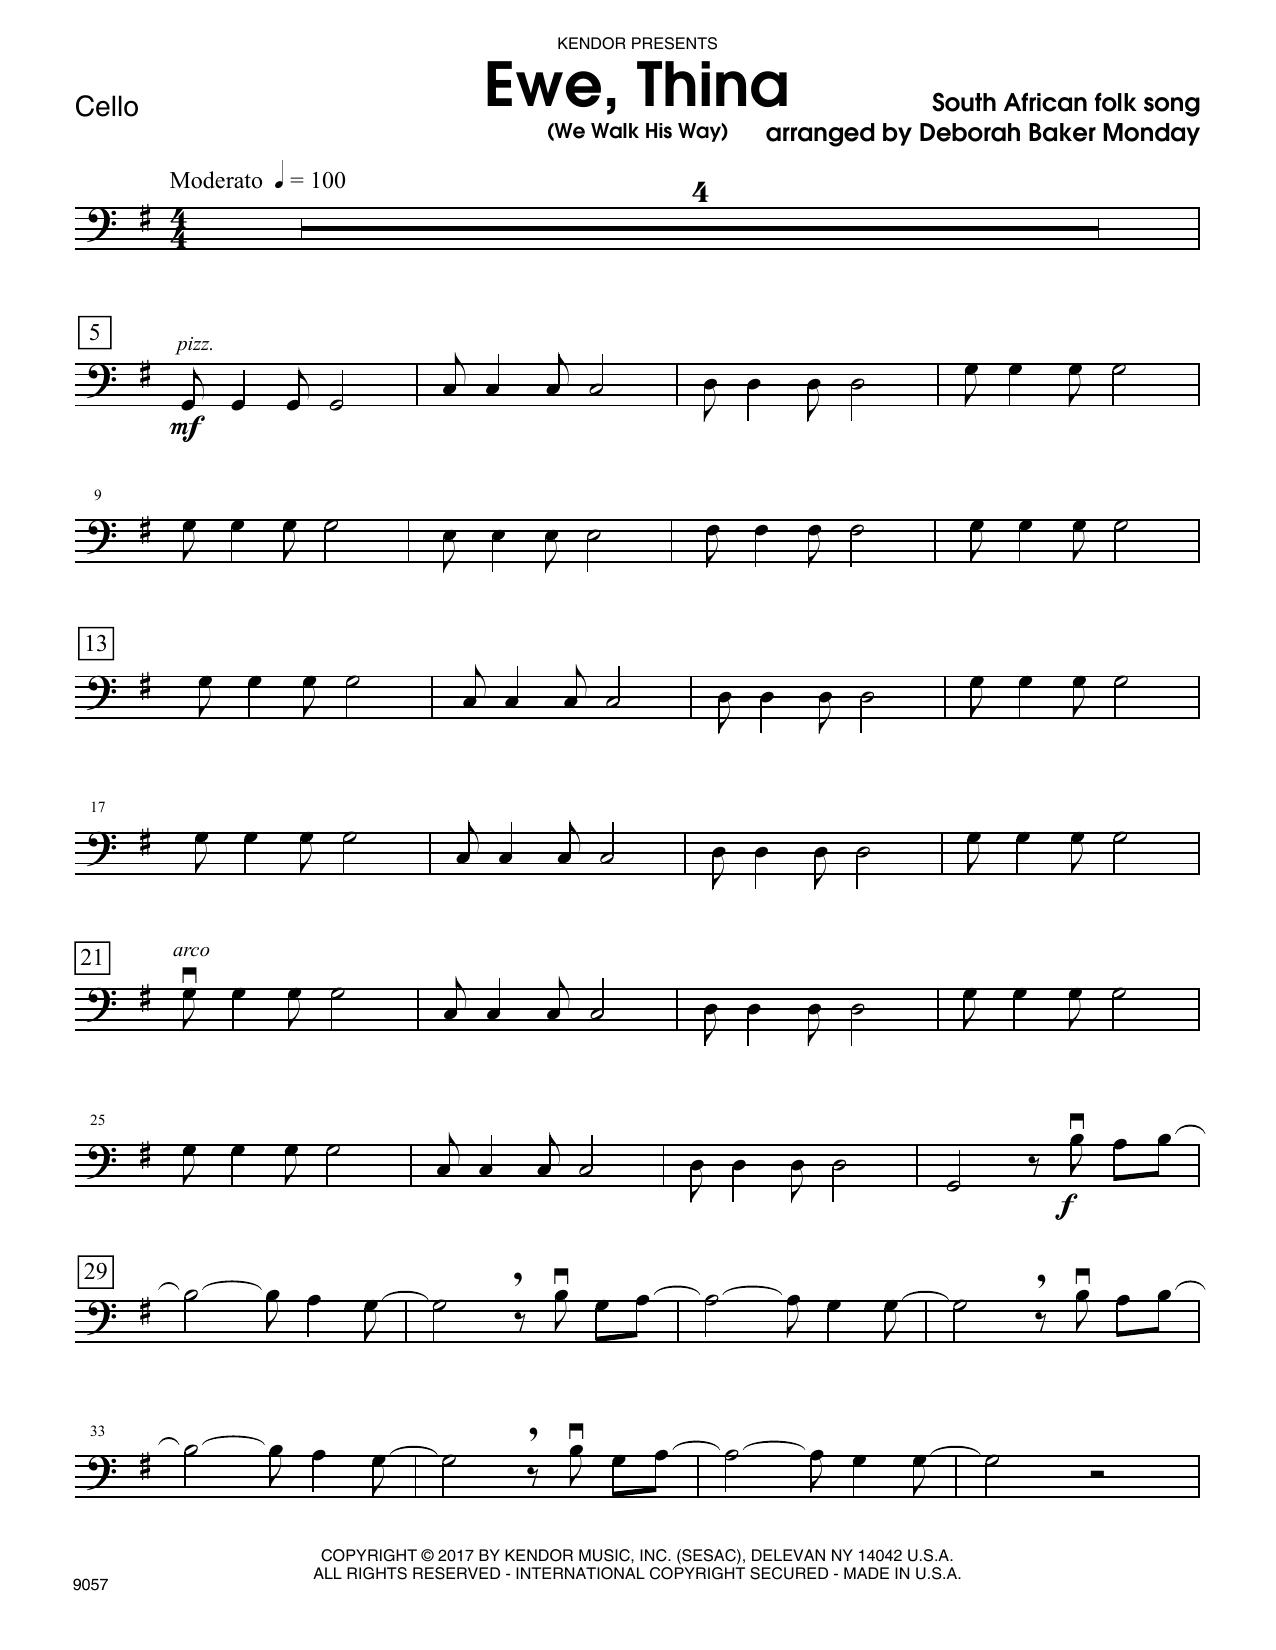 Ewe, Thina (We Walk His Way) - Cello